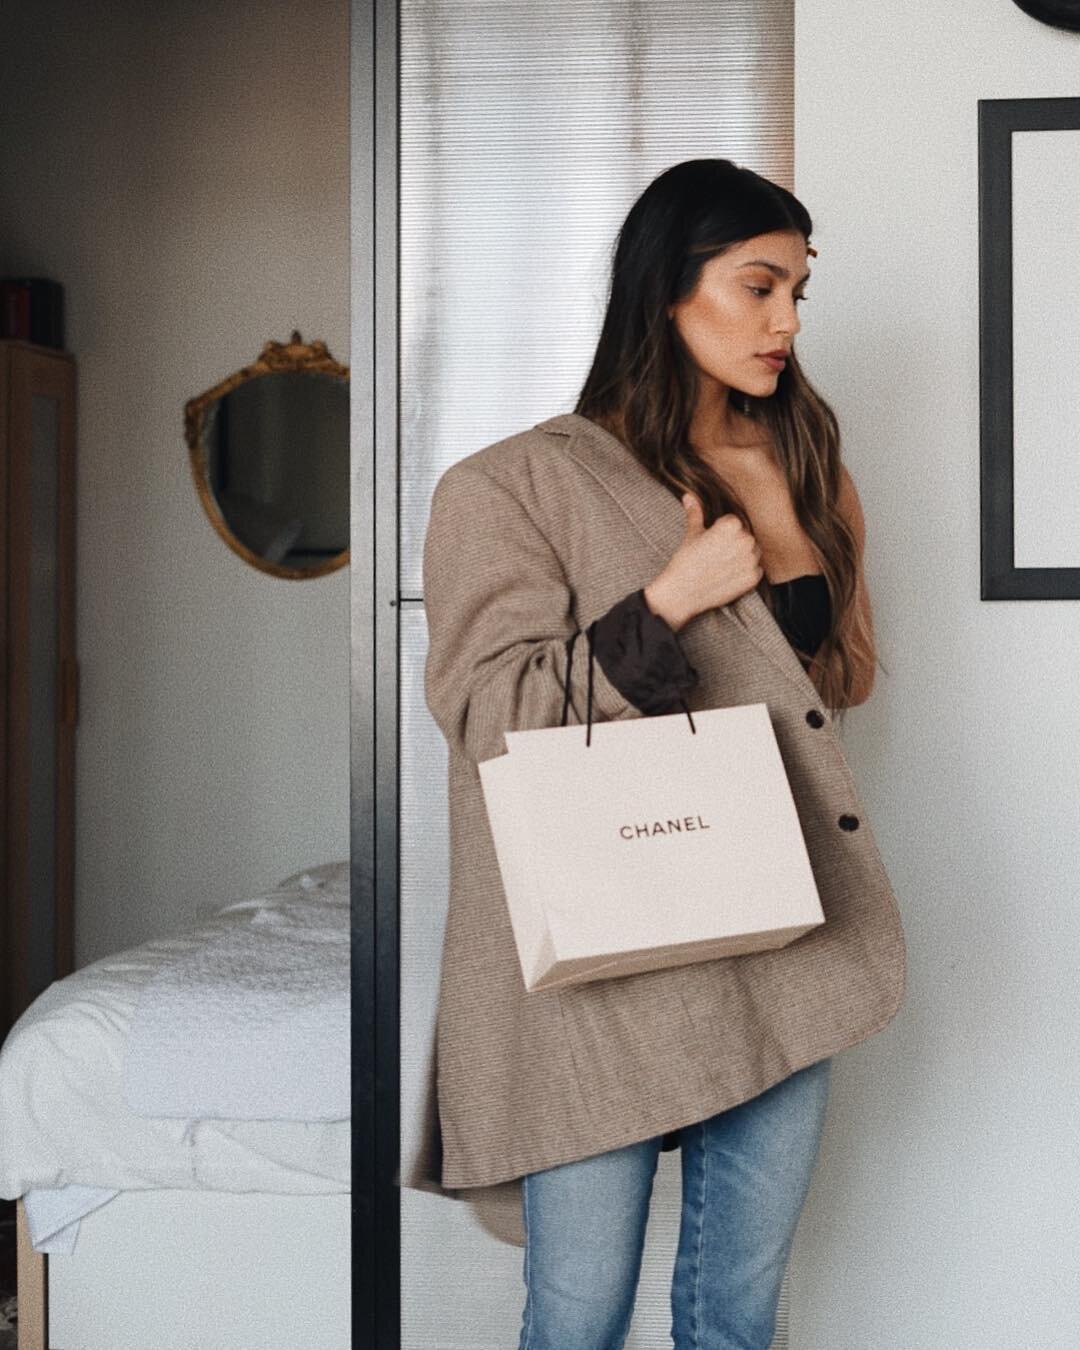 taraleighrose-instagram-toronto-tara-fashion-blogger